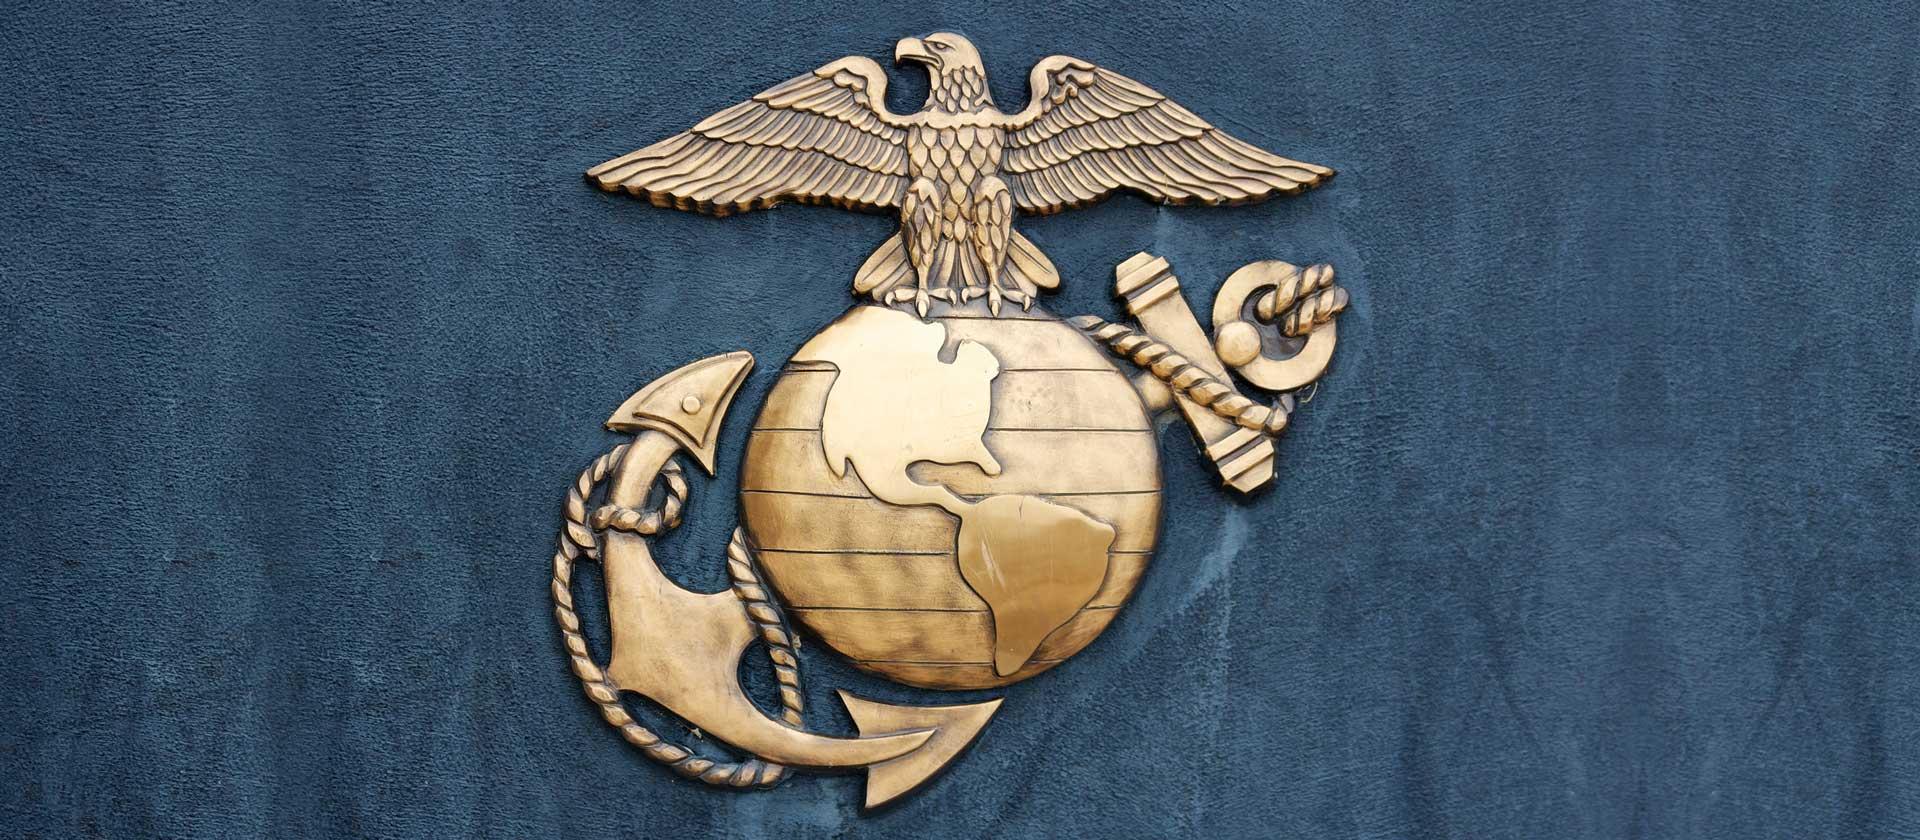 United States Marine Corps ensignia